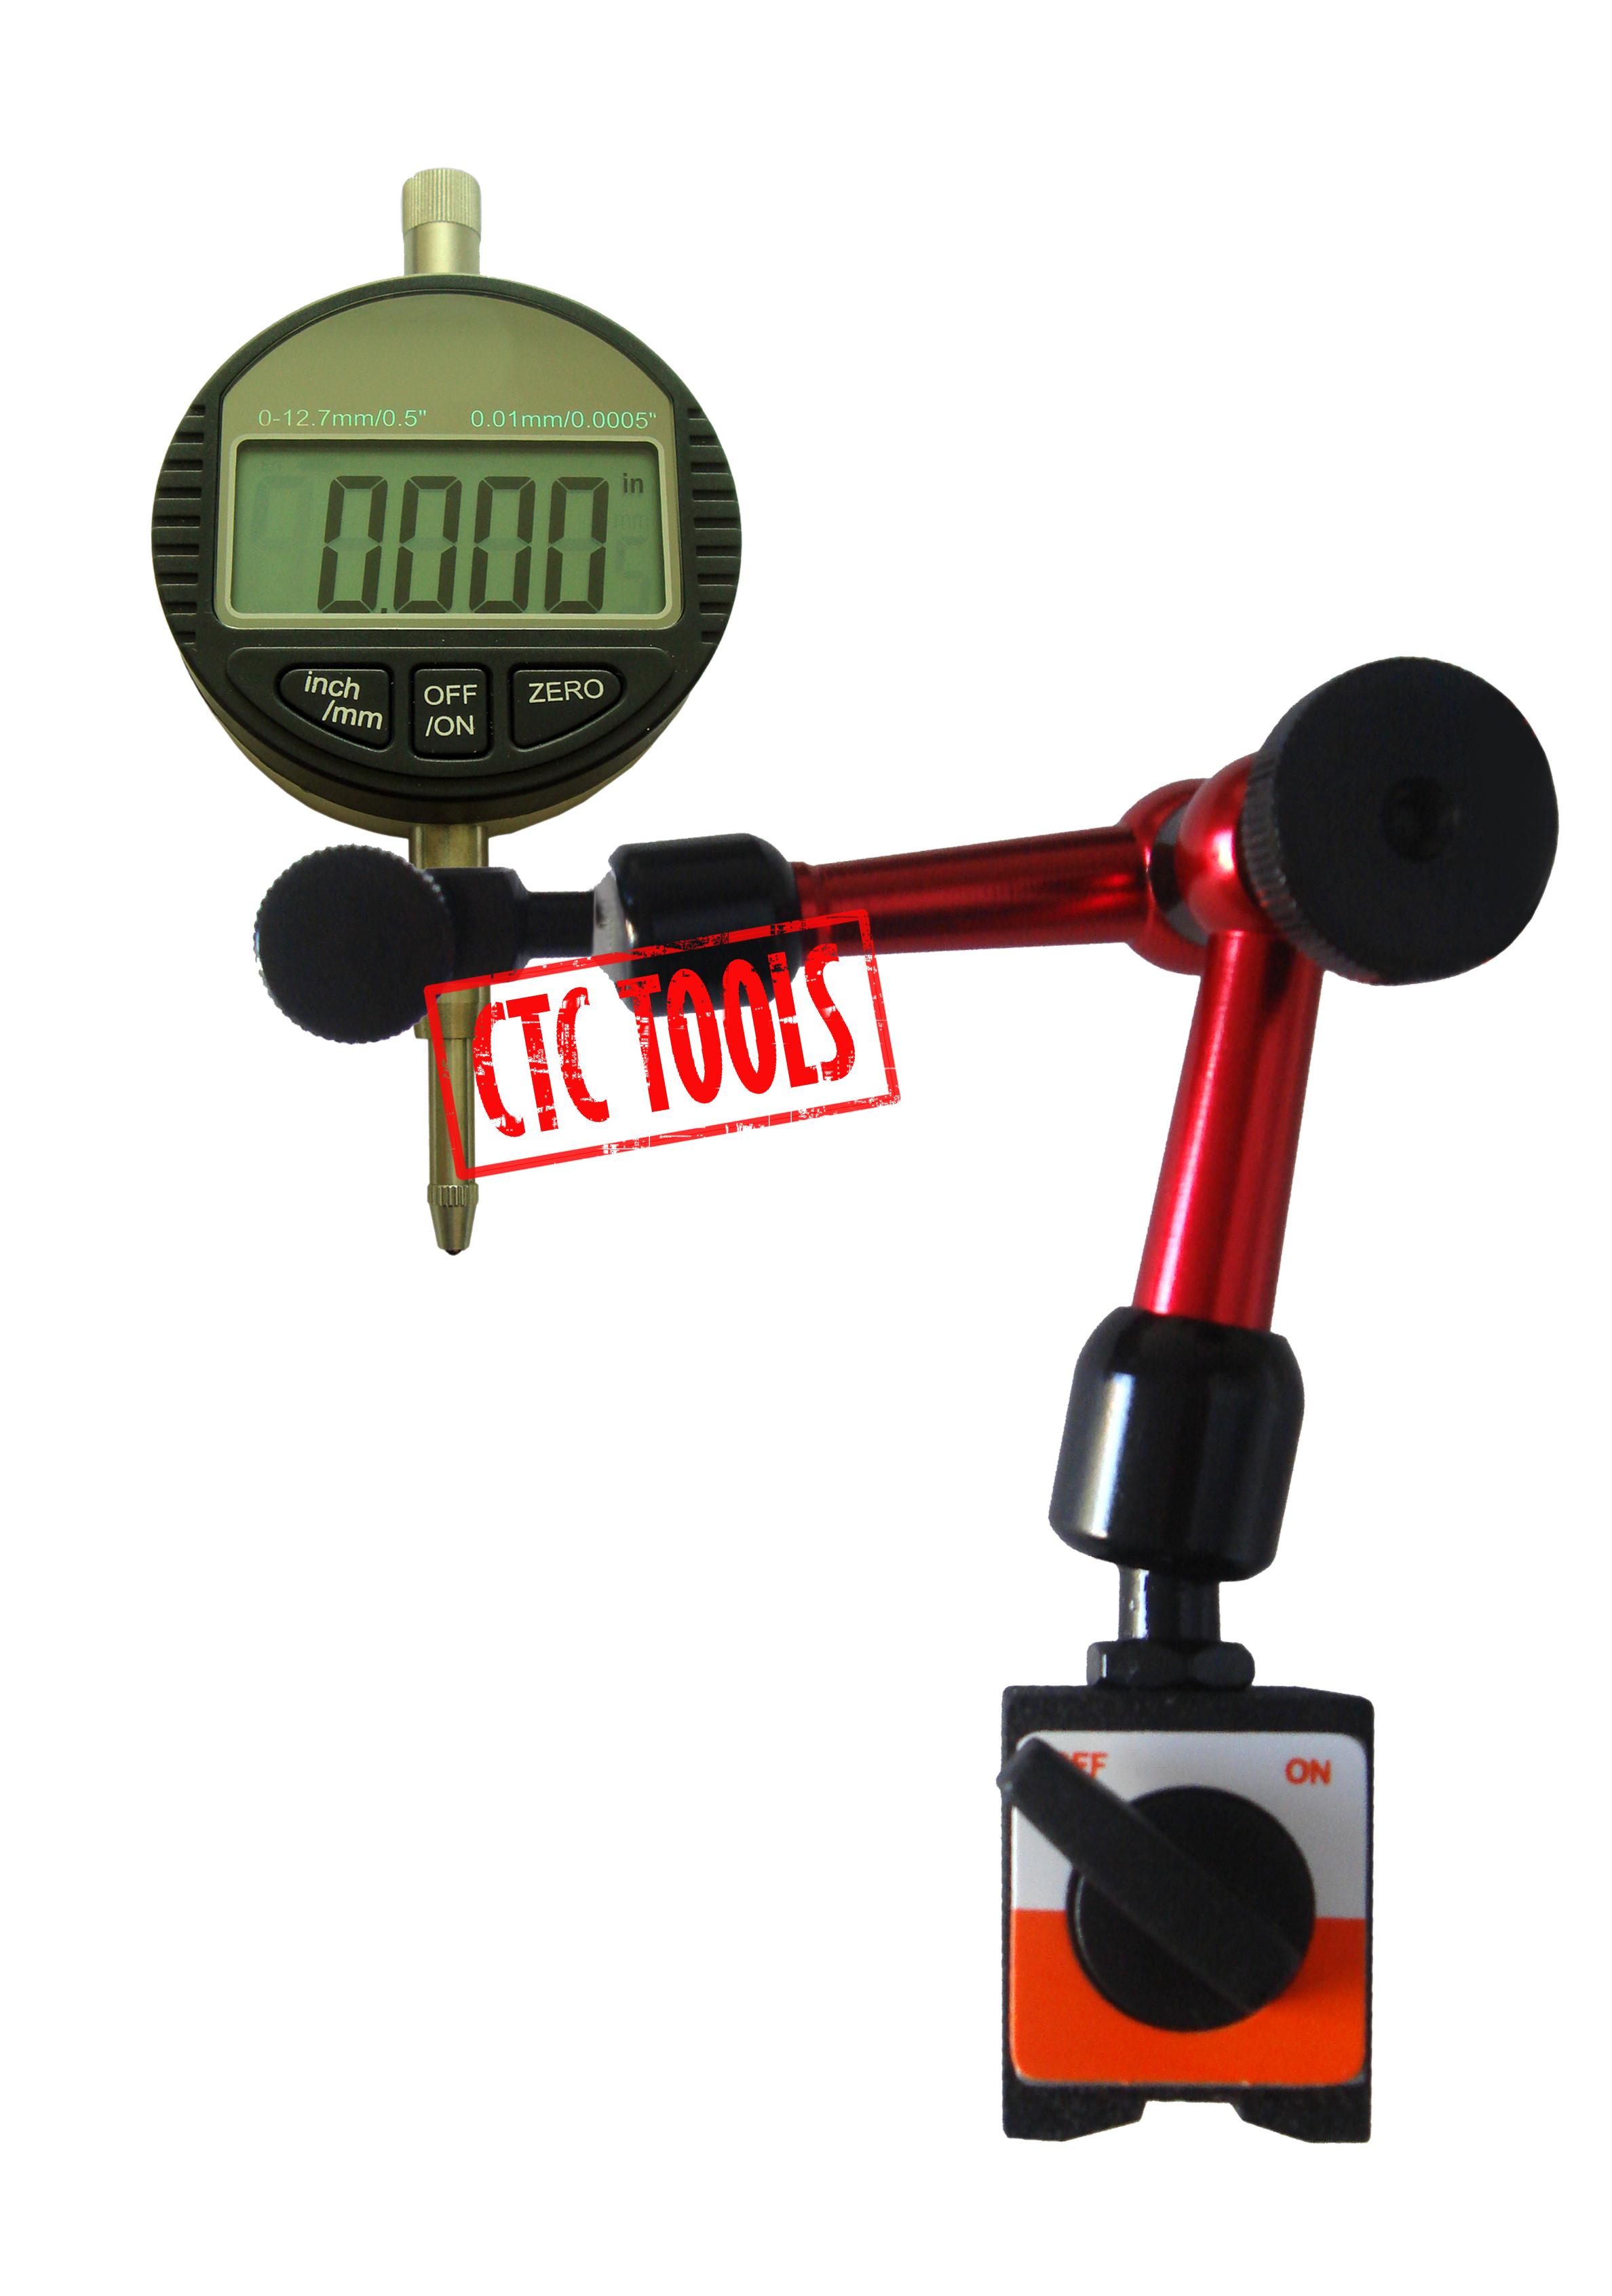 Digital Dial Indicator Gauge Amp Magnetic Base Measuring